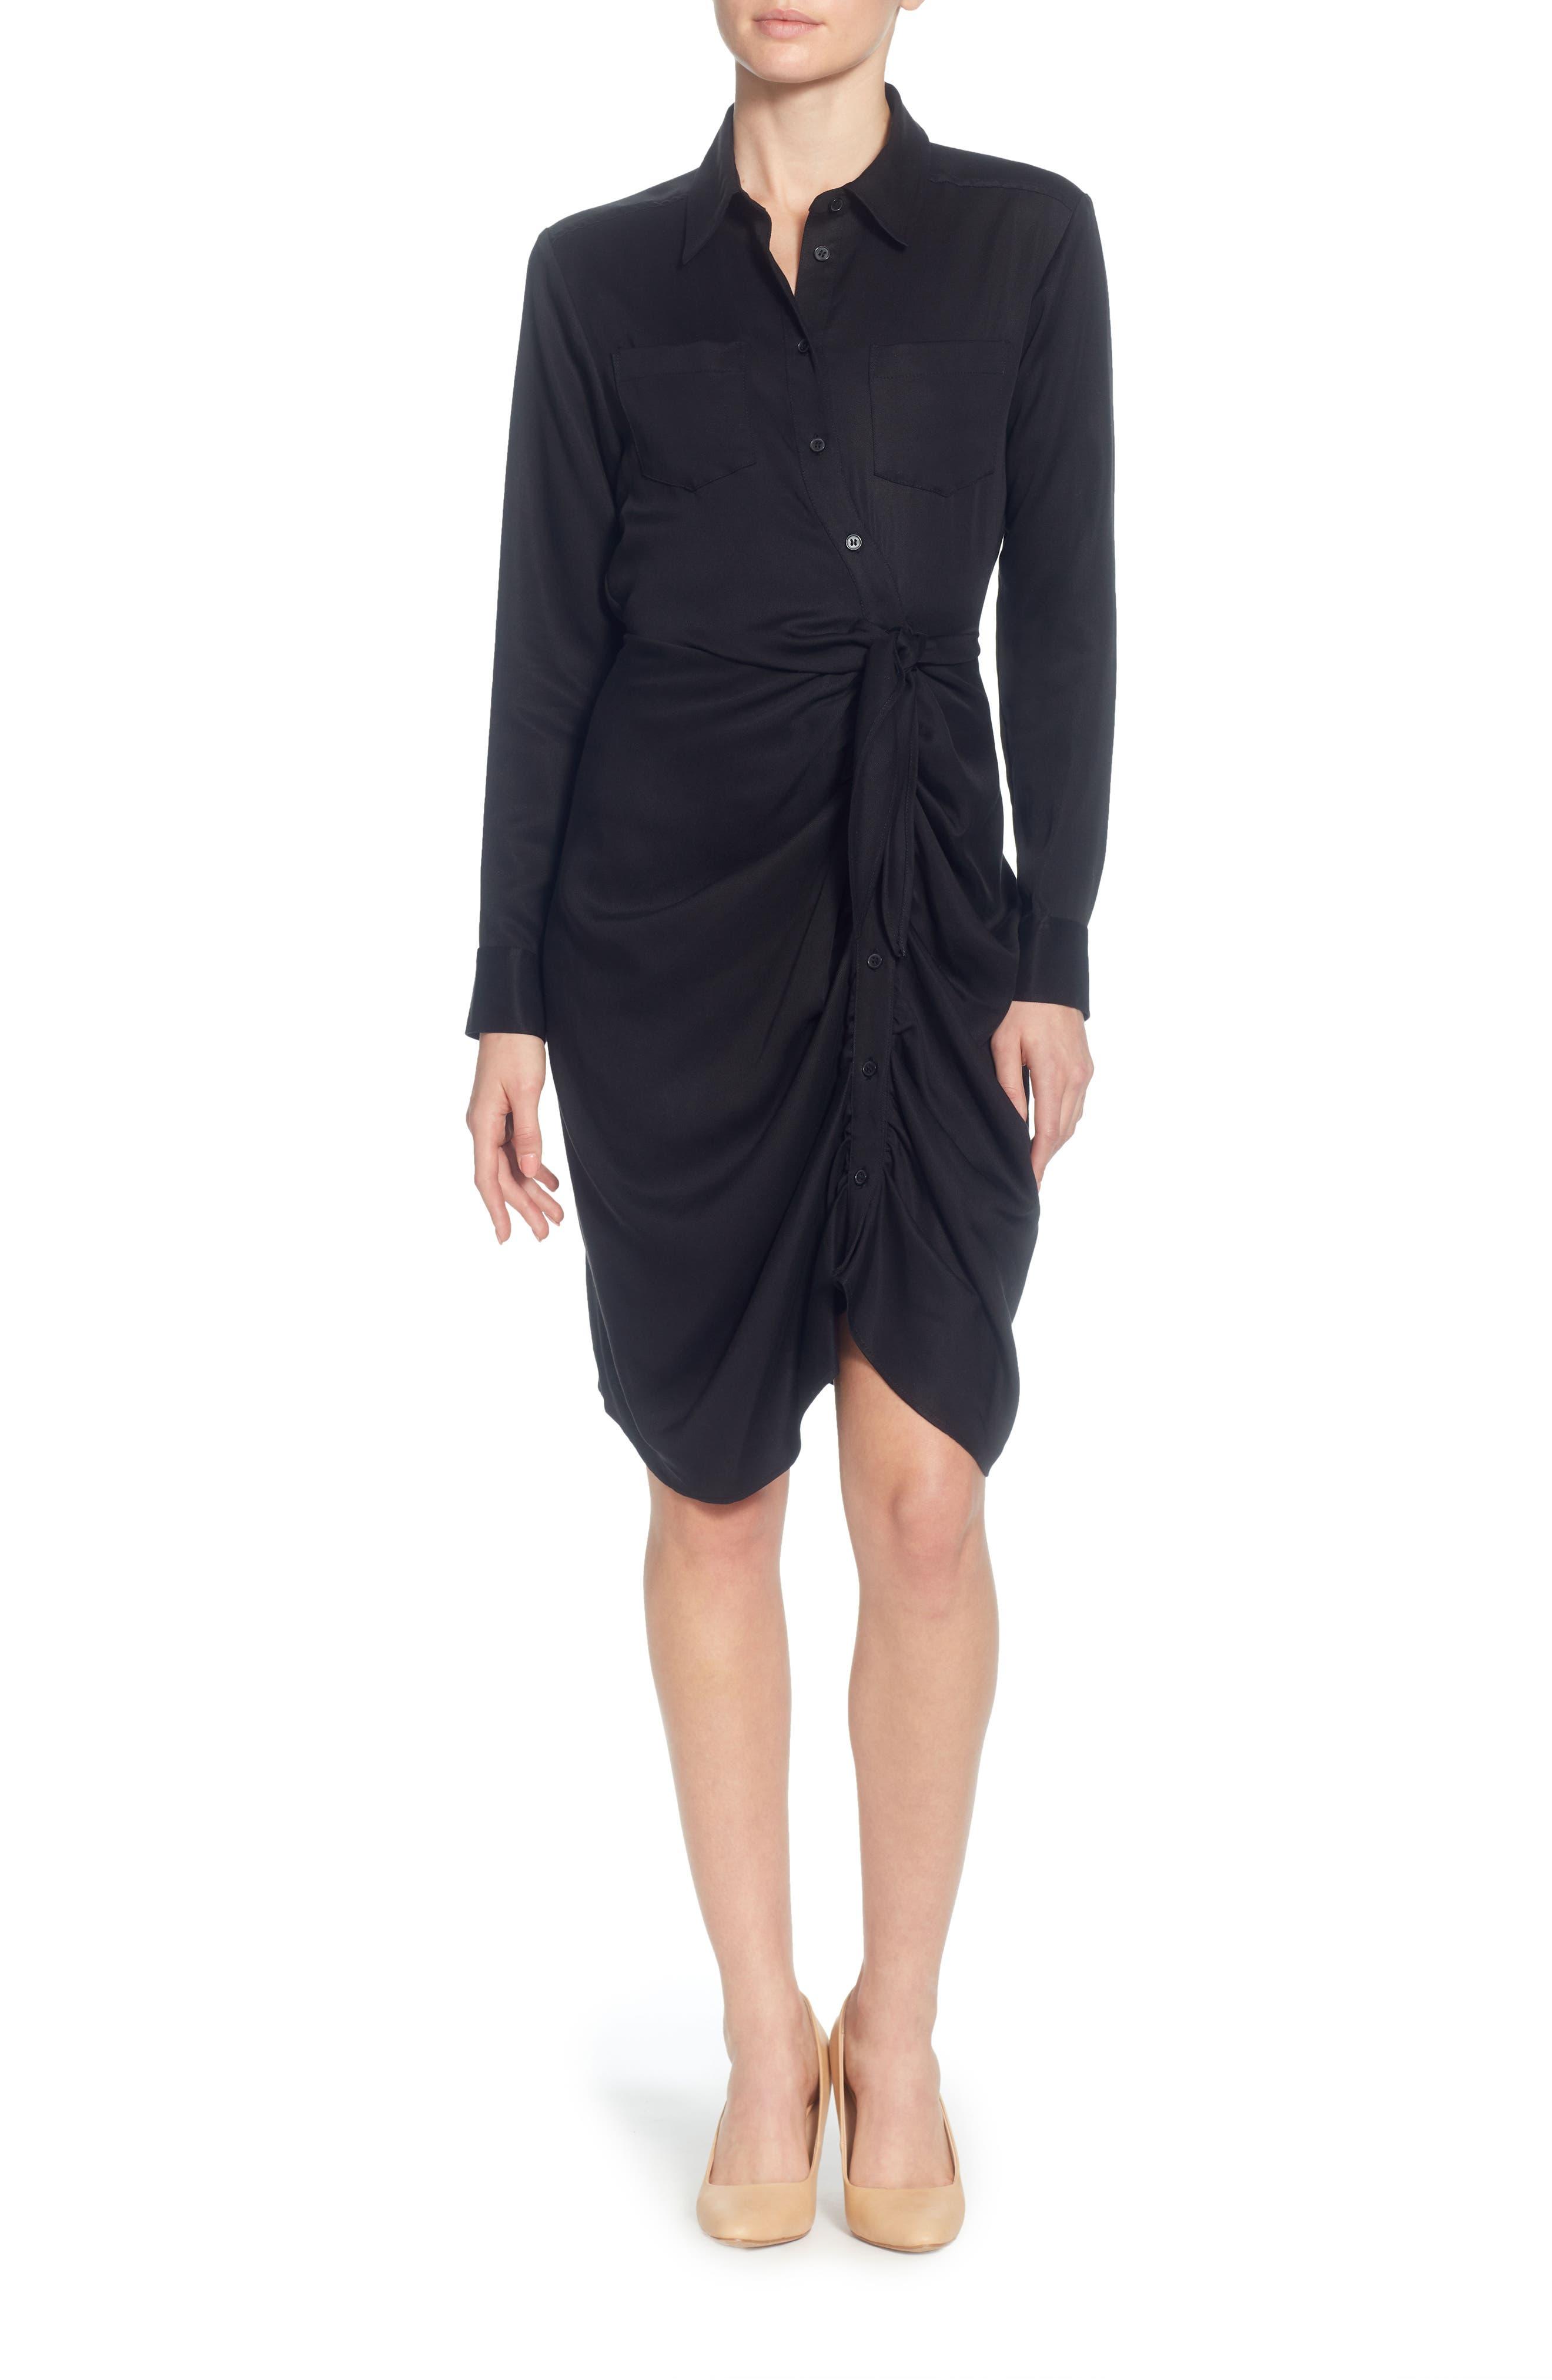 Main Image - Catherine Catherine Malandrino Sloan Tie-Waist Dress